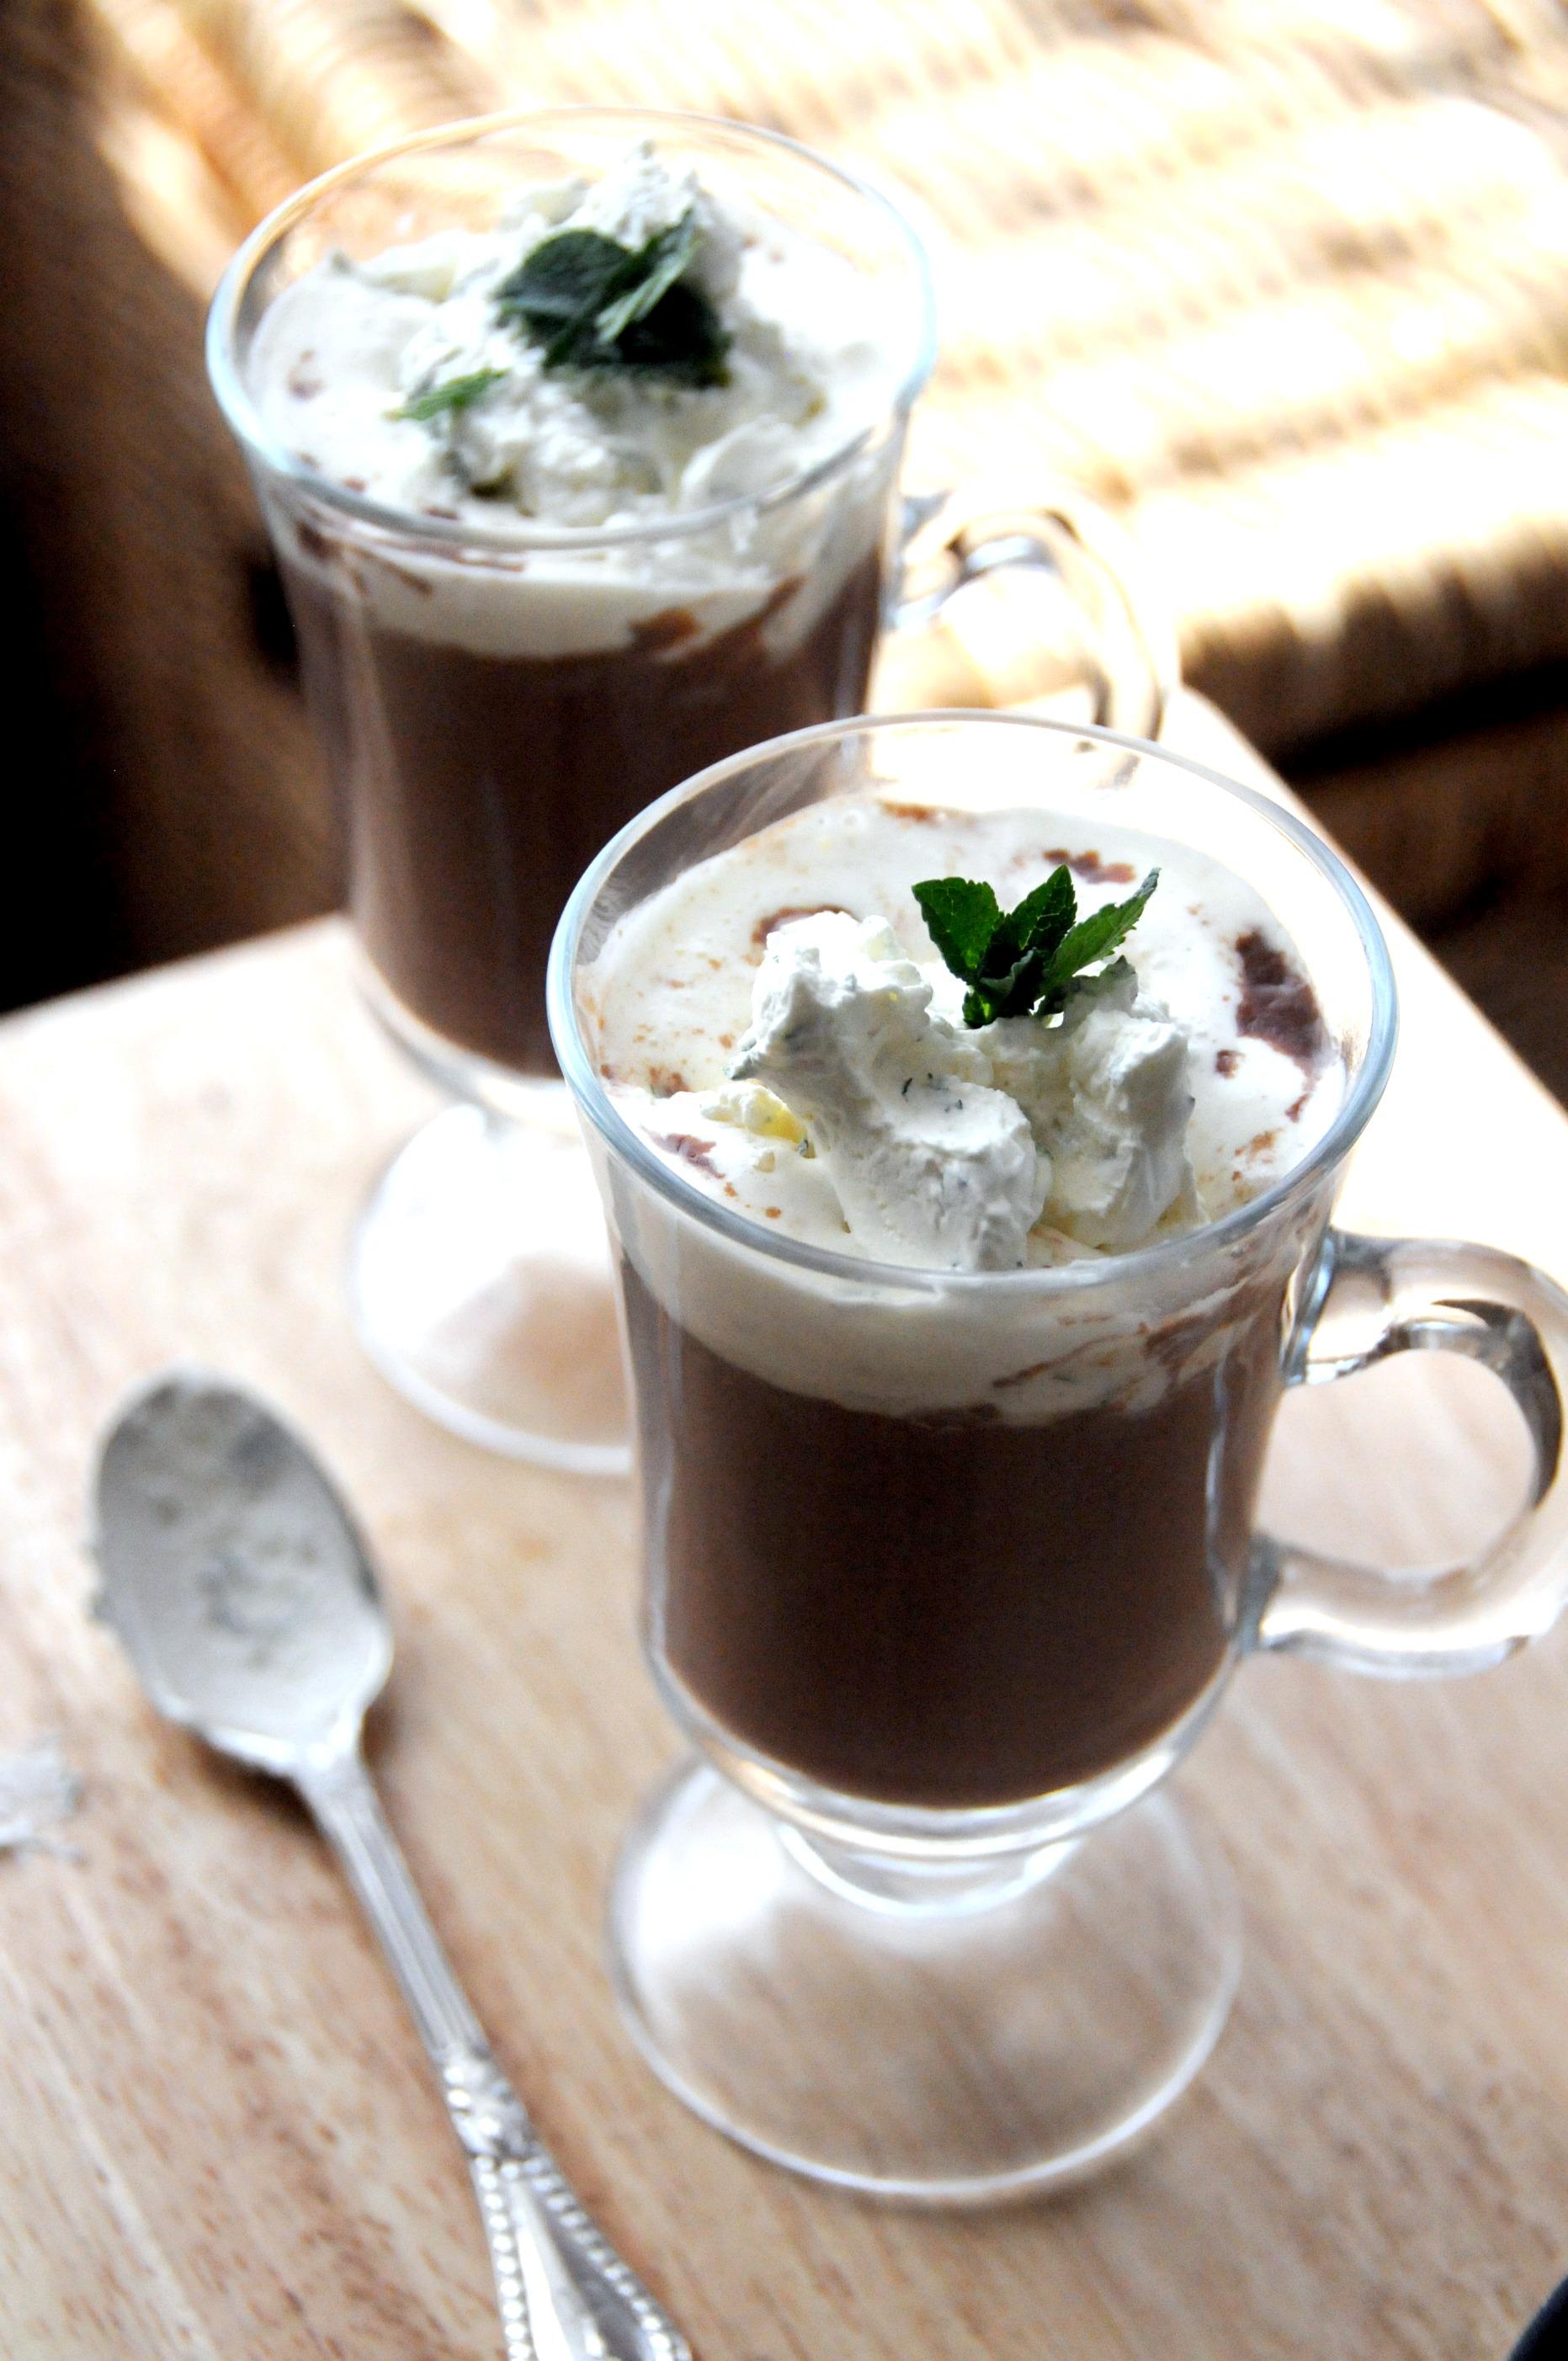 ... Fairtrade: Ultimate Mint Hot Chocolate - Ren Behan Food | renbehan.com